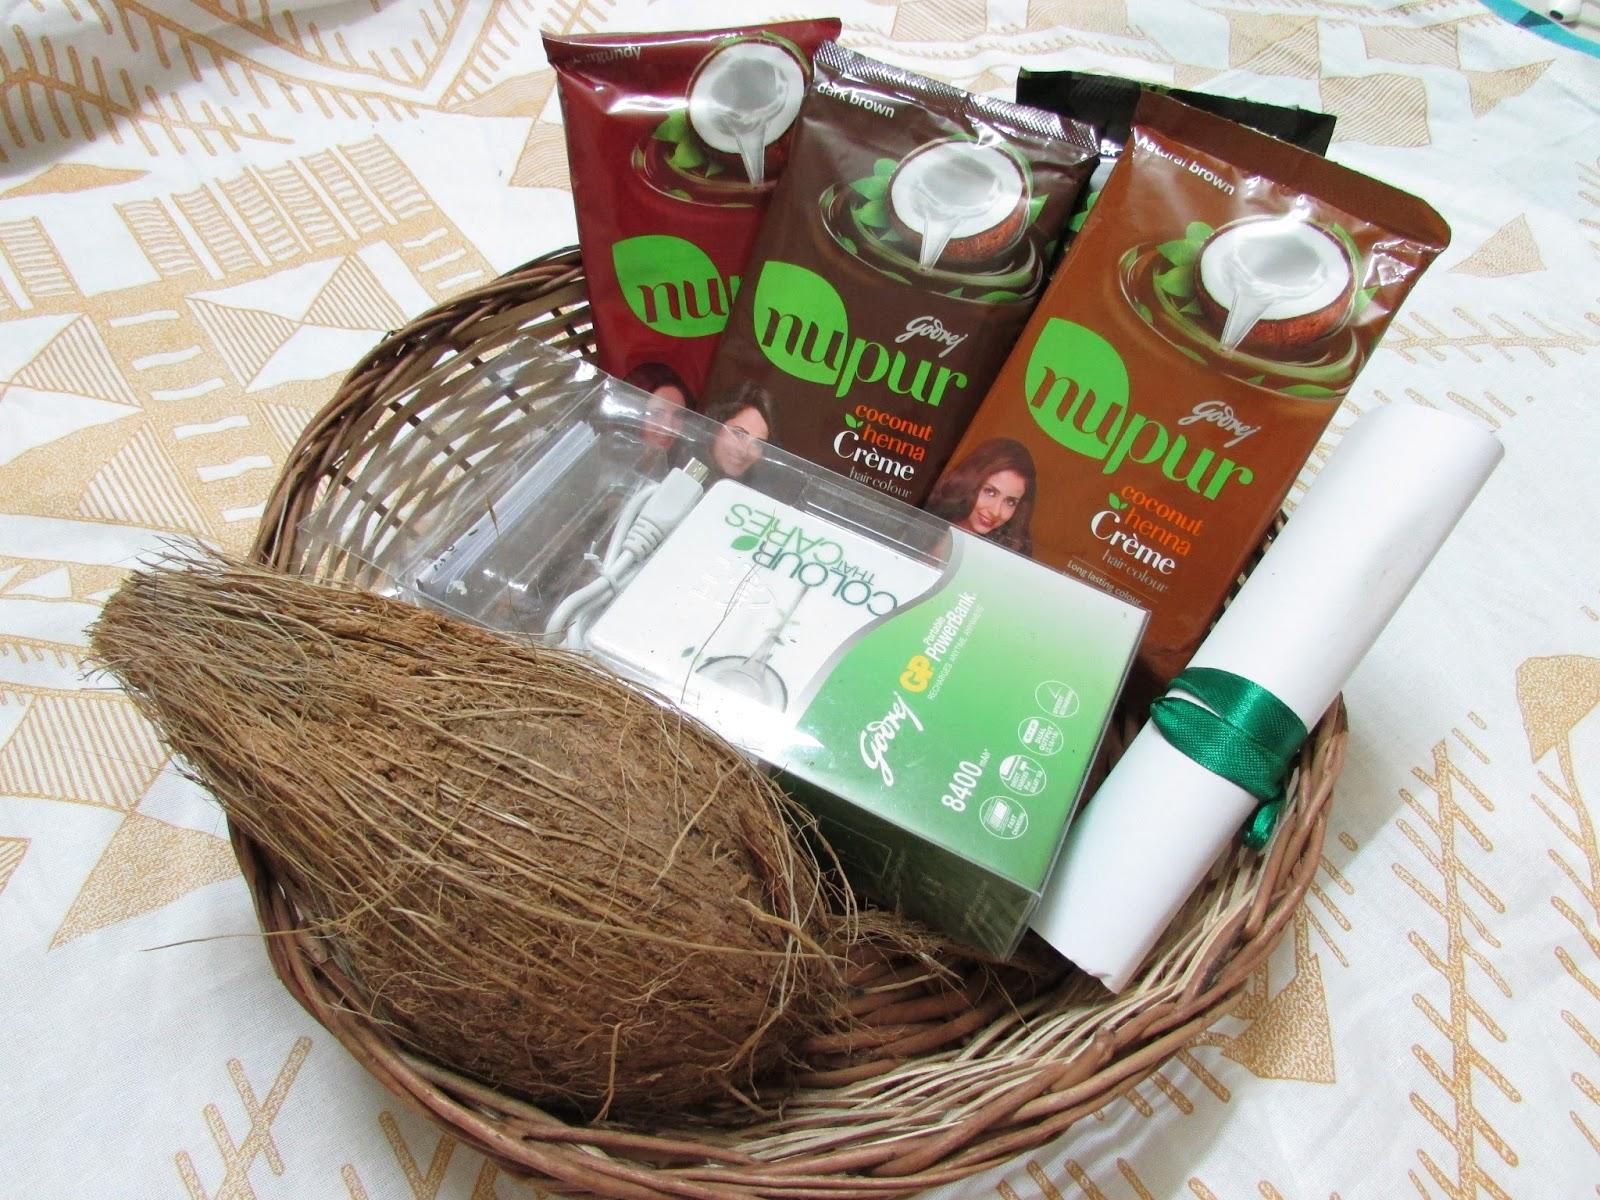 Godrej Nupur Coconut Henna Creme Hair Color Review